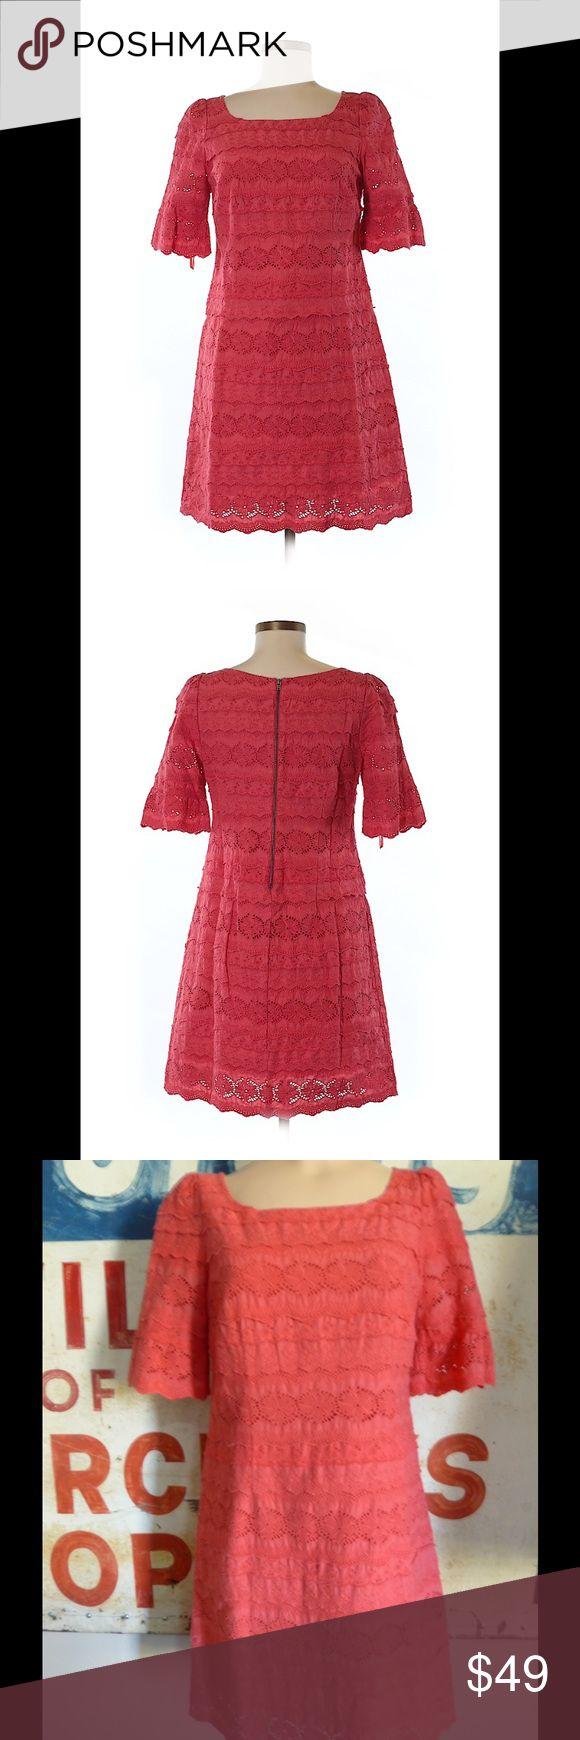 Age 6 red dress dream